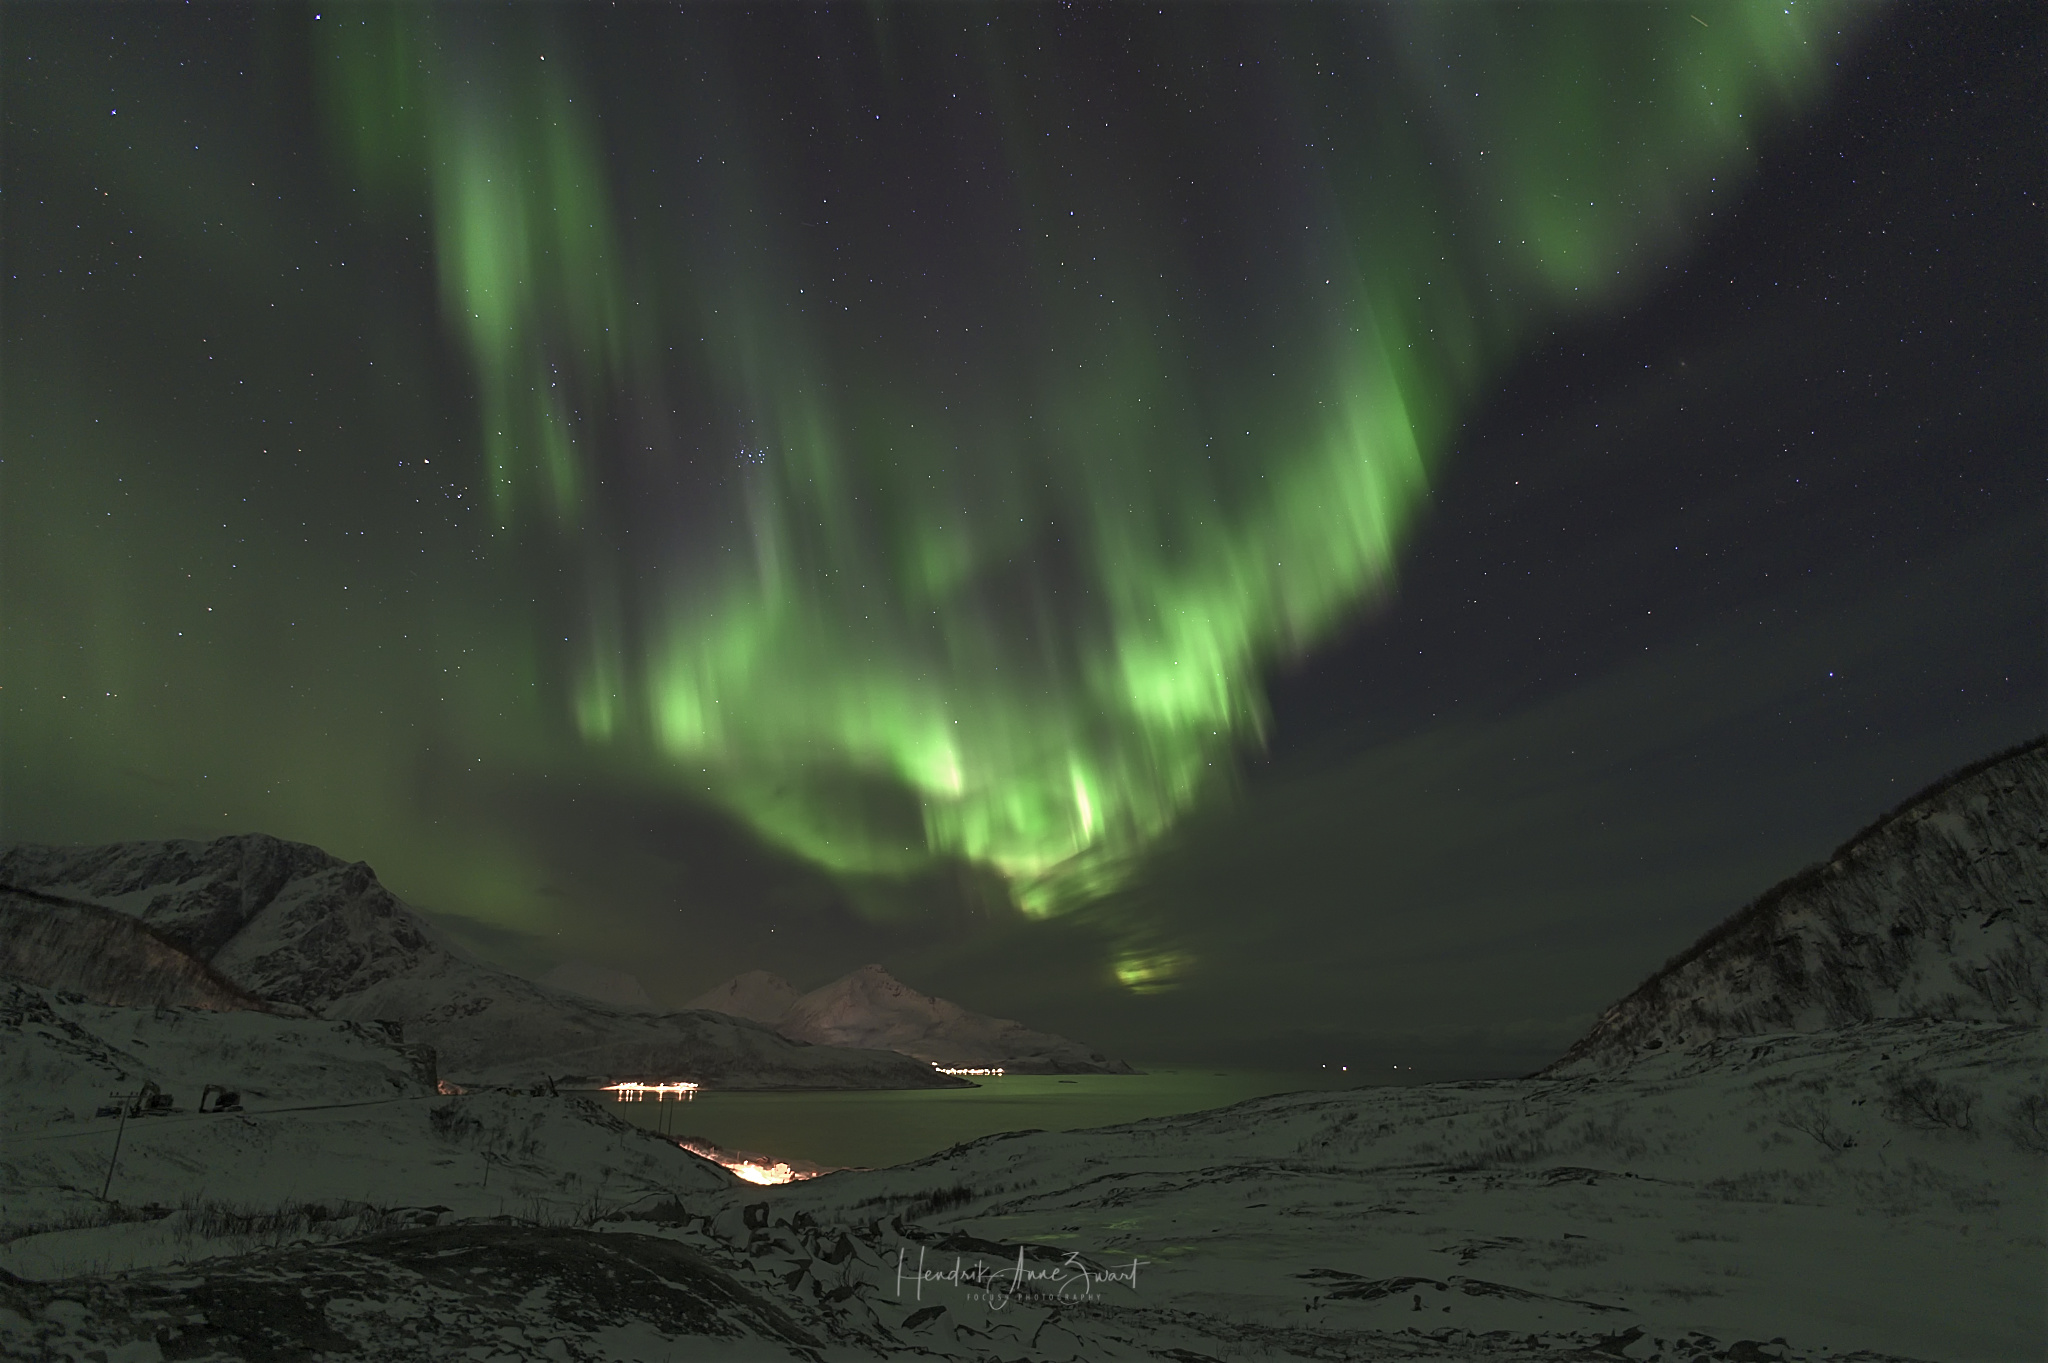 TROMSø - INTO THE POLAR NIGHT14 Dec - 21 Dec 2019